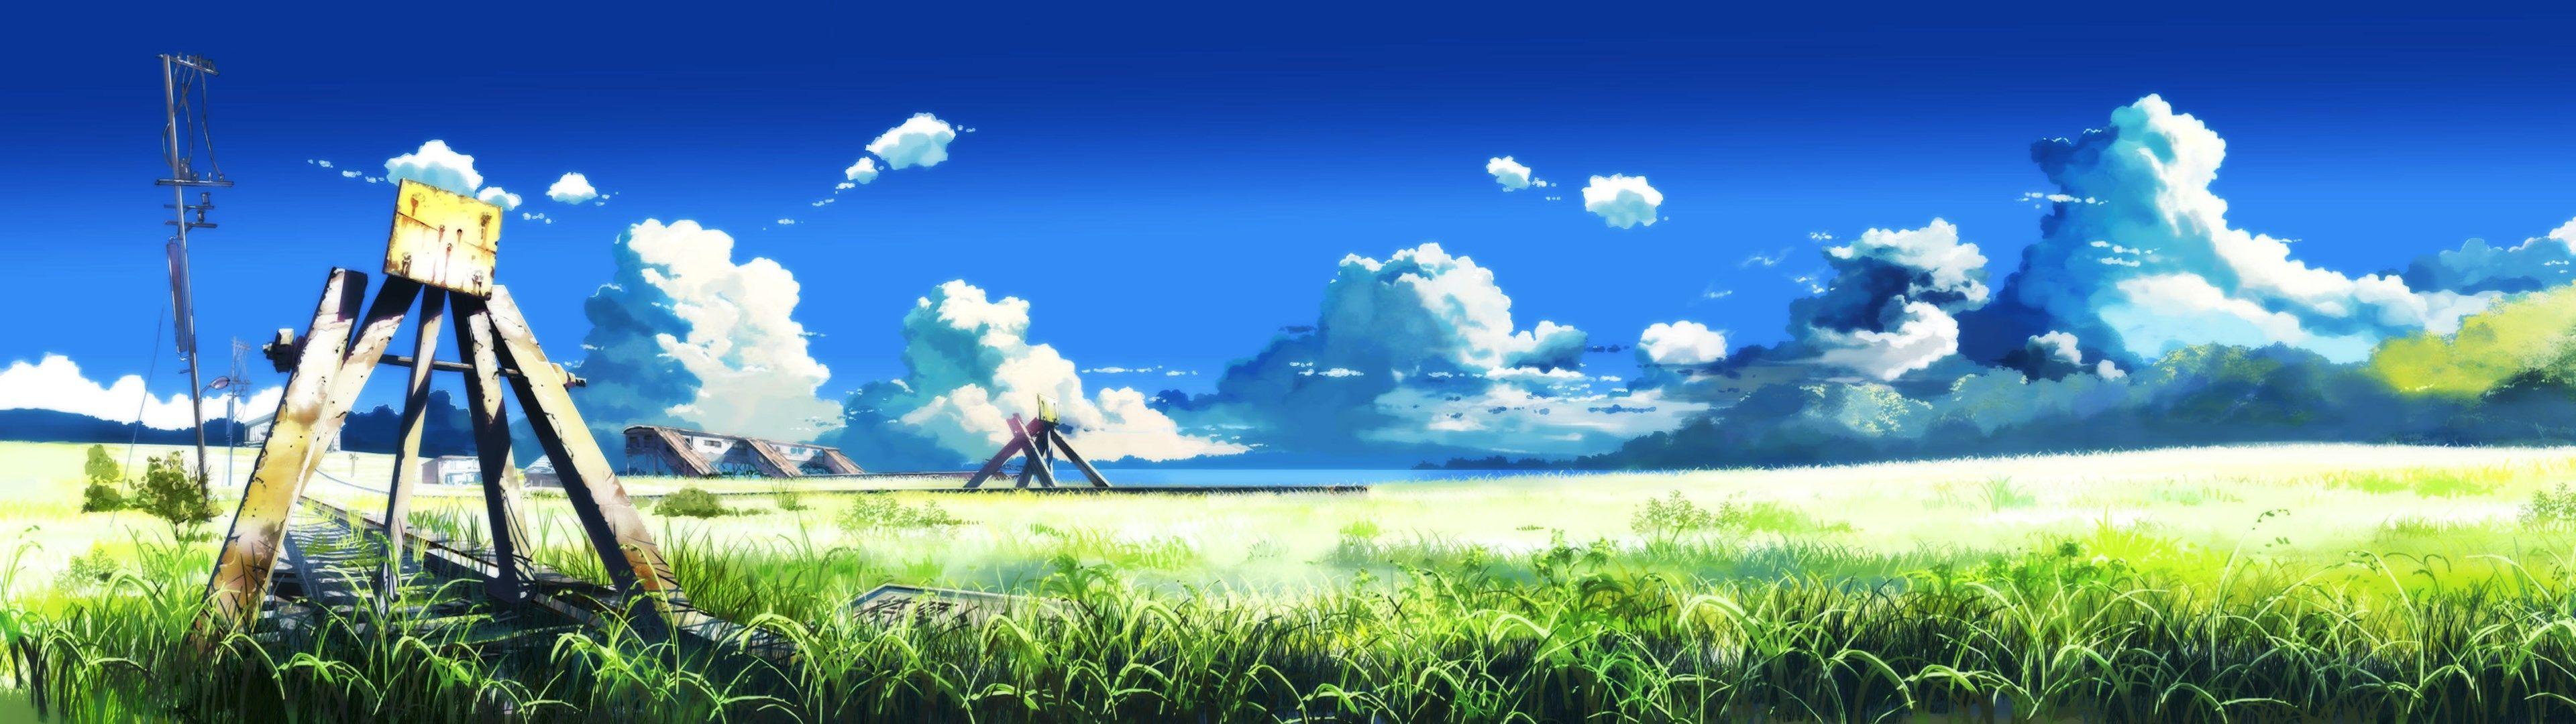 Wallpapers Free Anime 風景の絵 草原 イラスト 風景